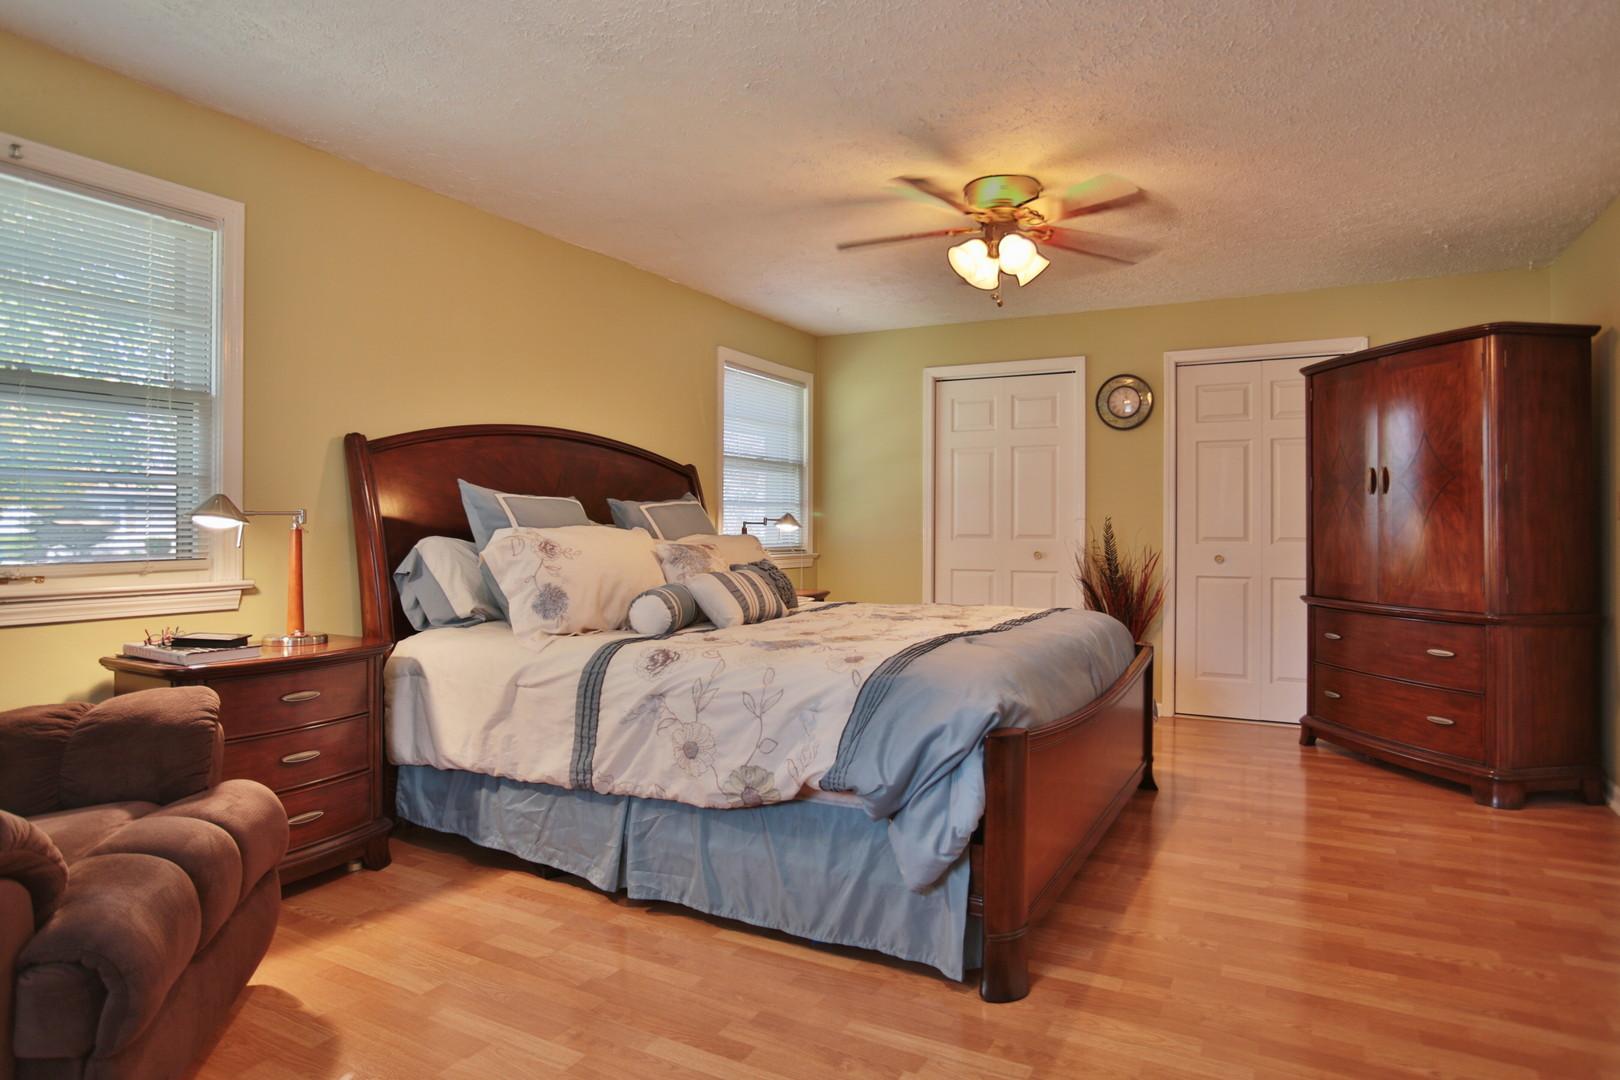 11413 Flowervale Lane Louisville, KY 40272 Bedroom